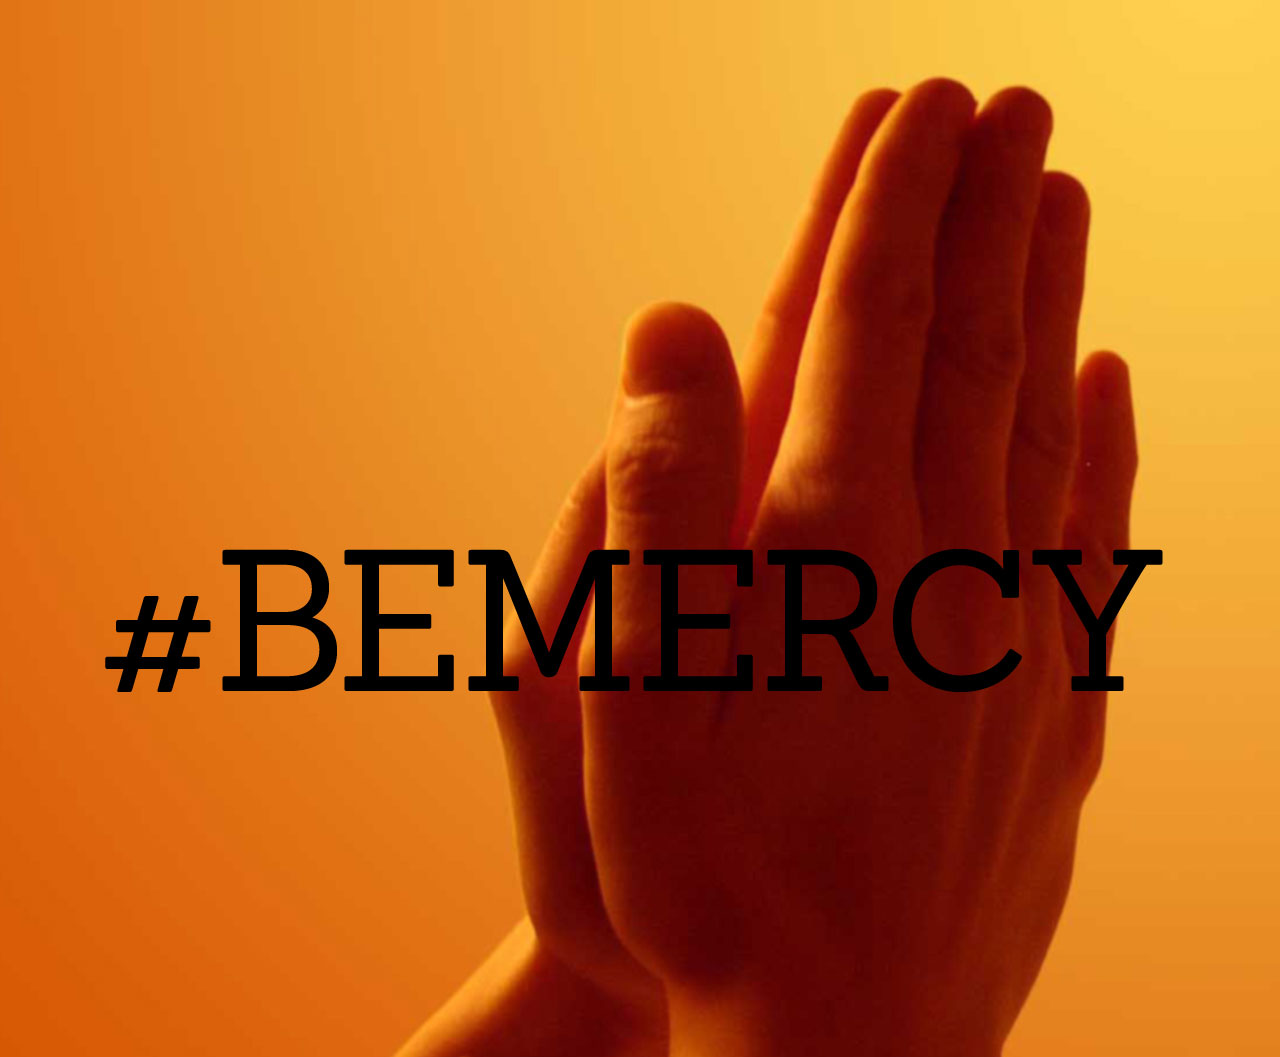 bemercy